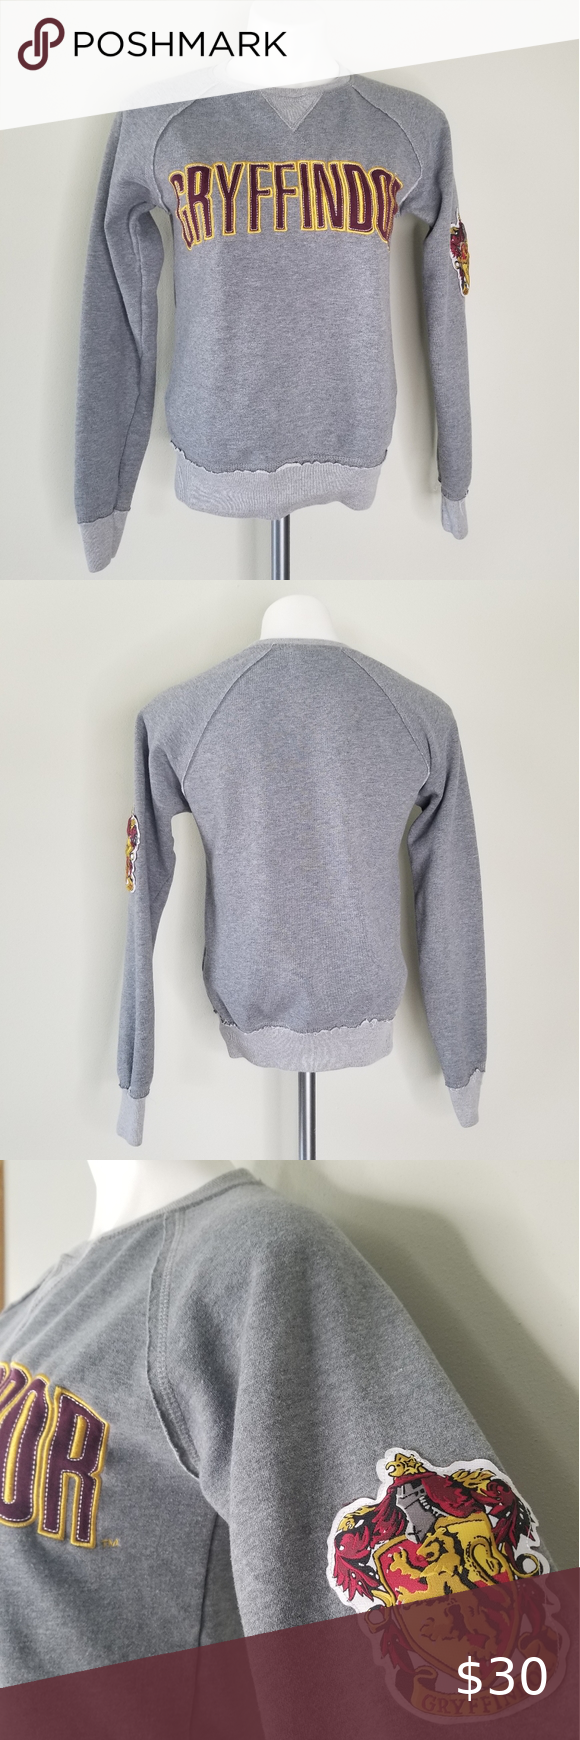 Gryffindor Harry Potter Crew Sweatshirt Size Xs Sweatshirts Crew Sweatshirts Sweatshirt Tops [ 1740 x 580 Pixel ]